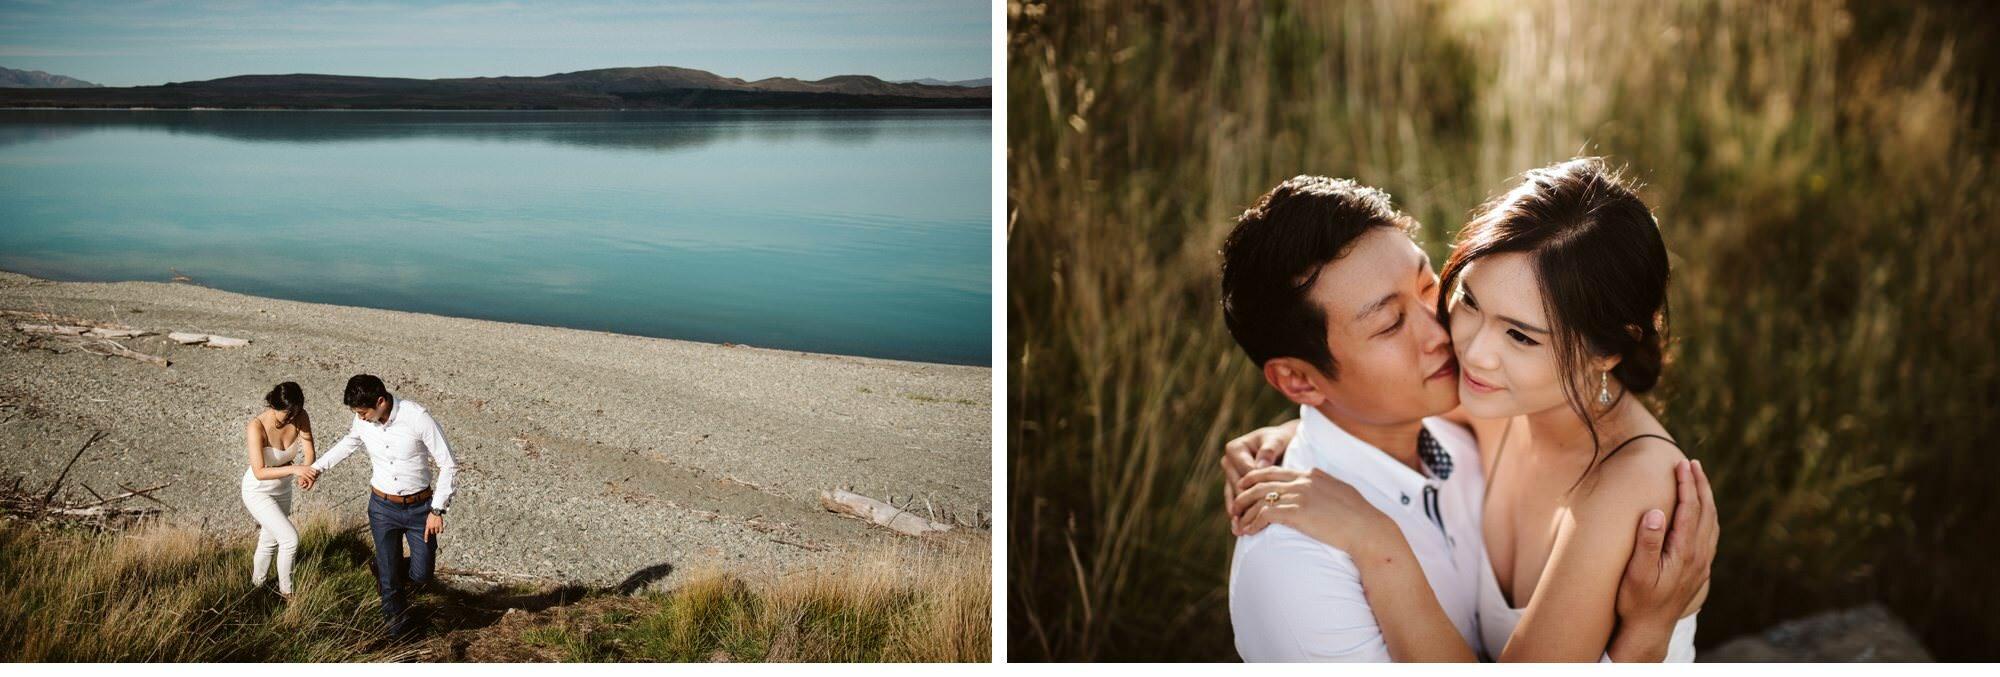 Mt Cook Pre Wedding Photographer-004.jpg